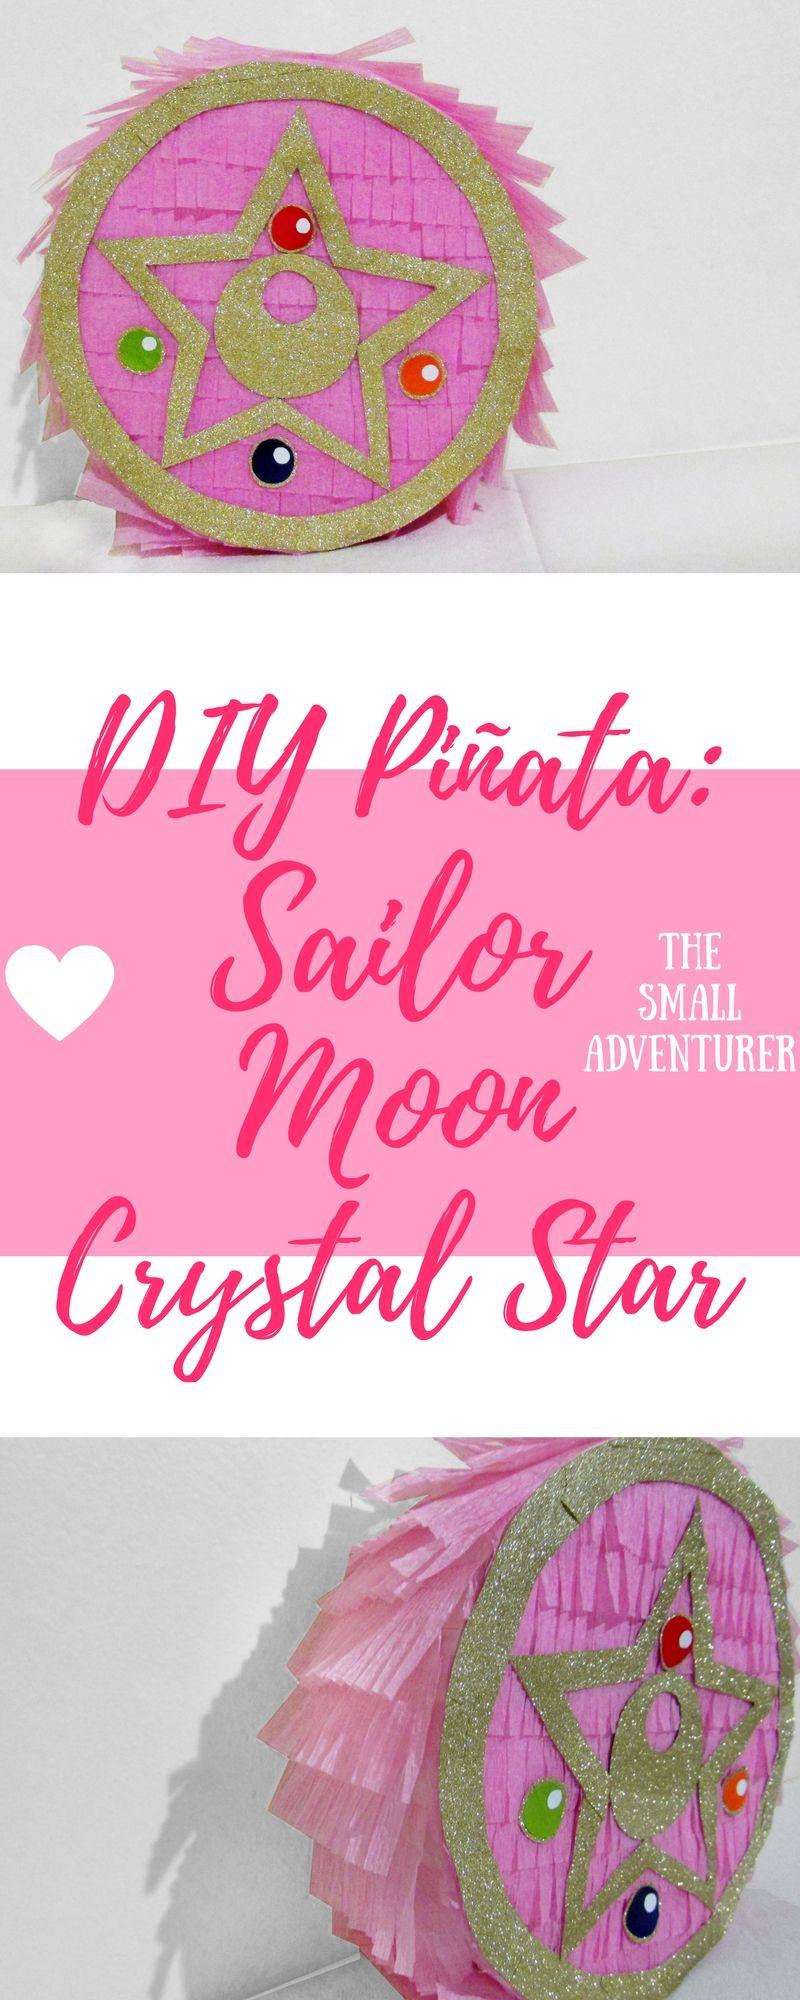 Crescent moon pinata with crystal